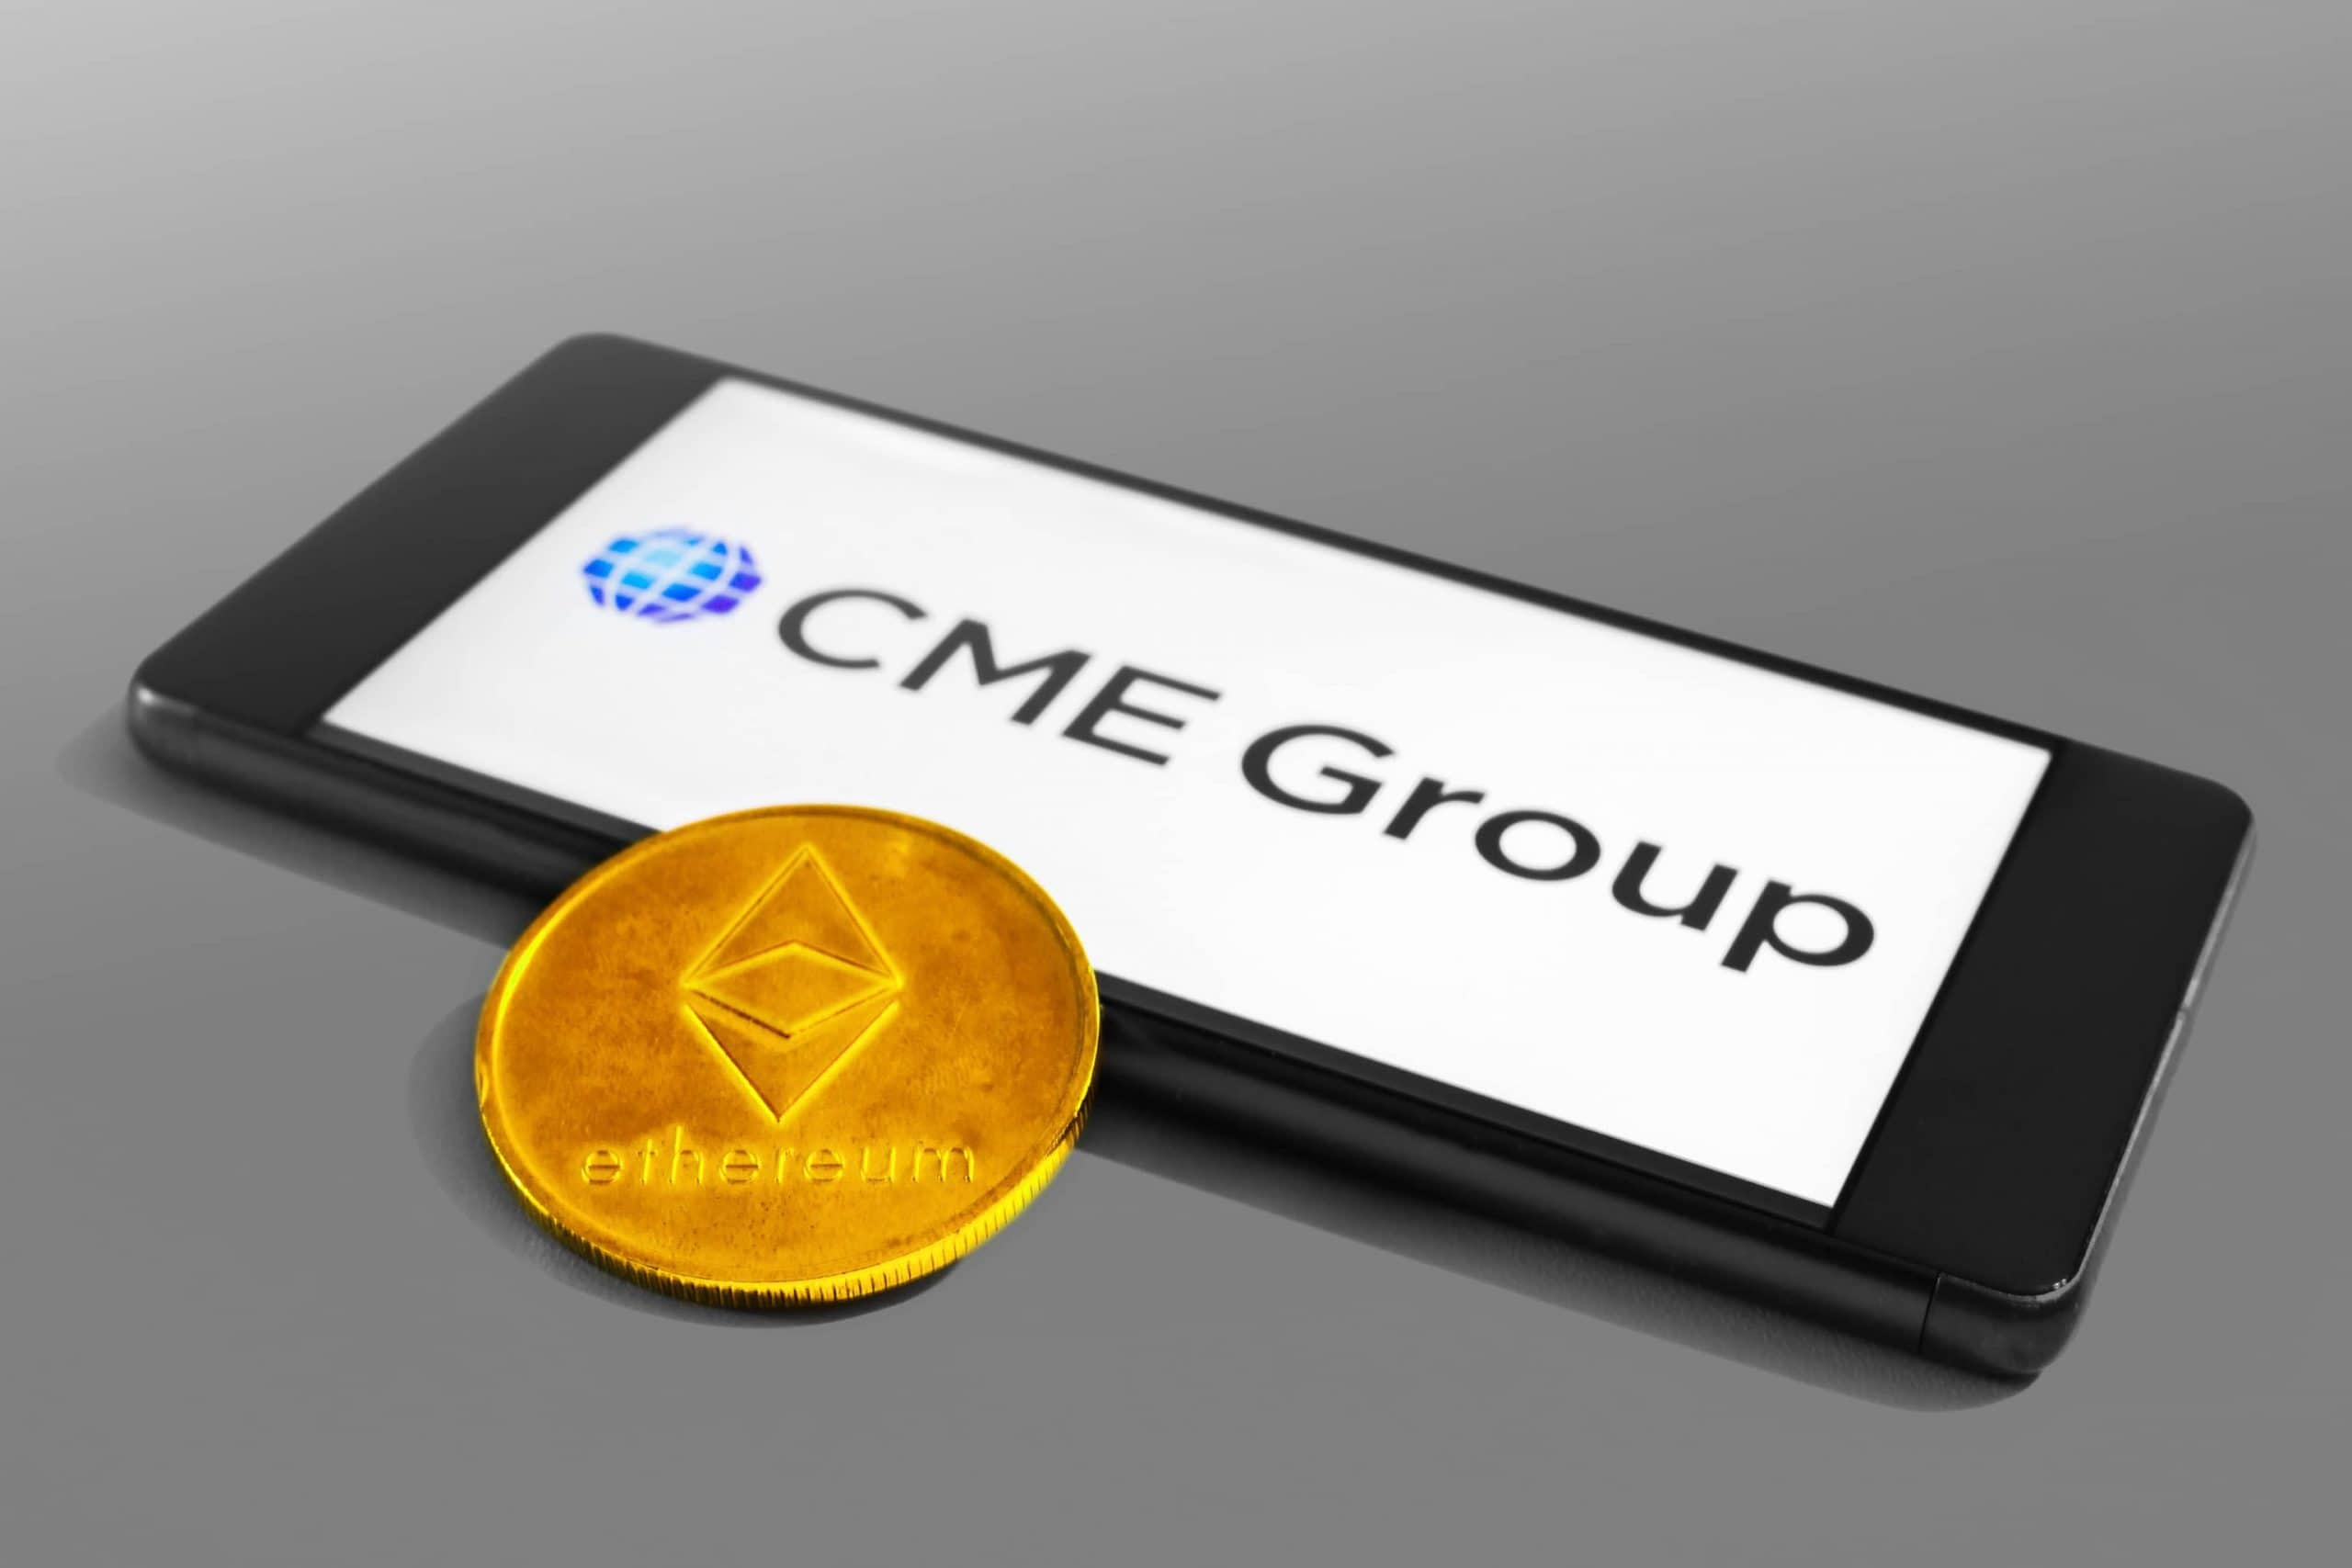 Ethereum CME